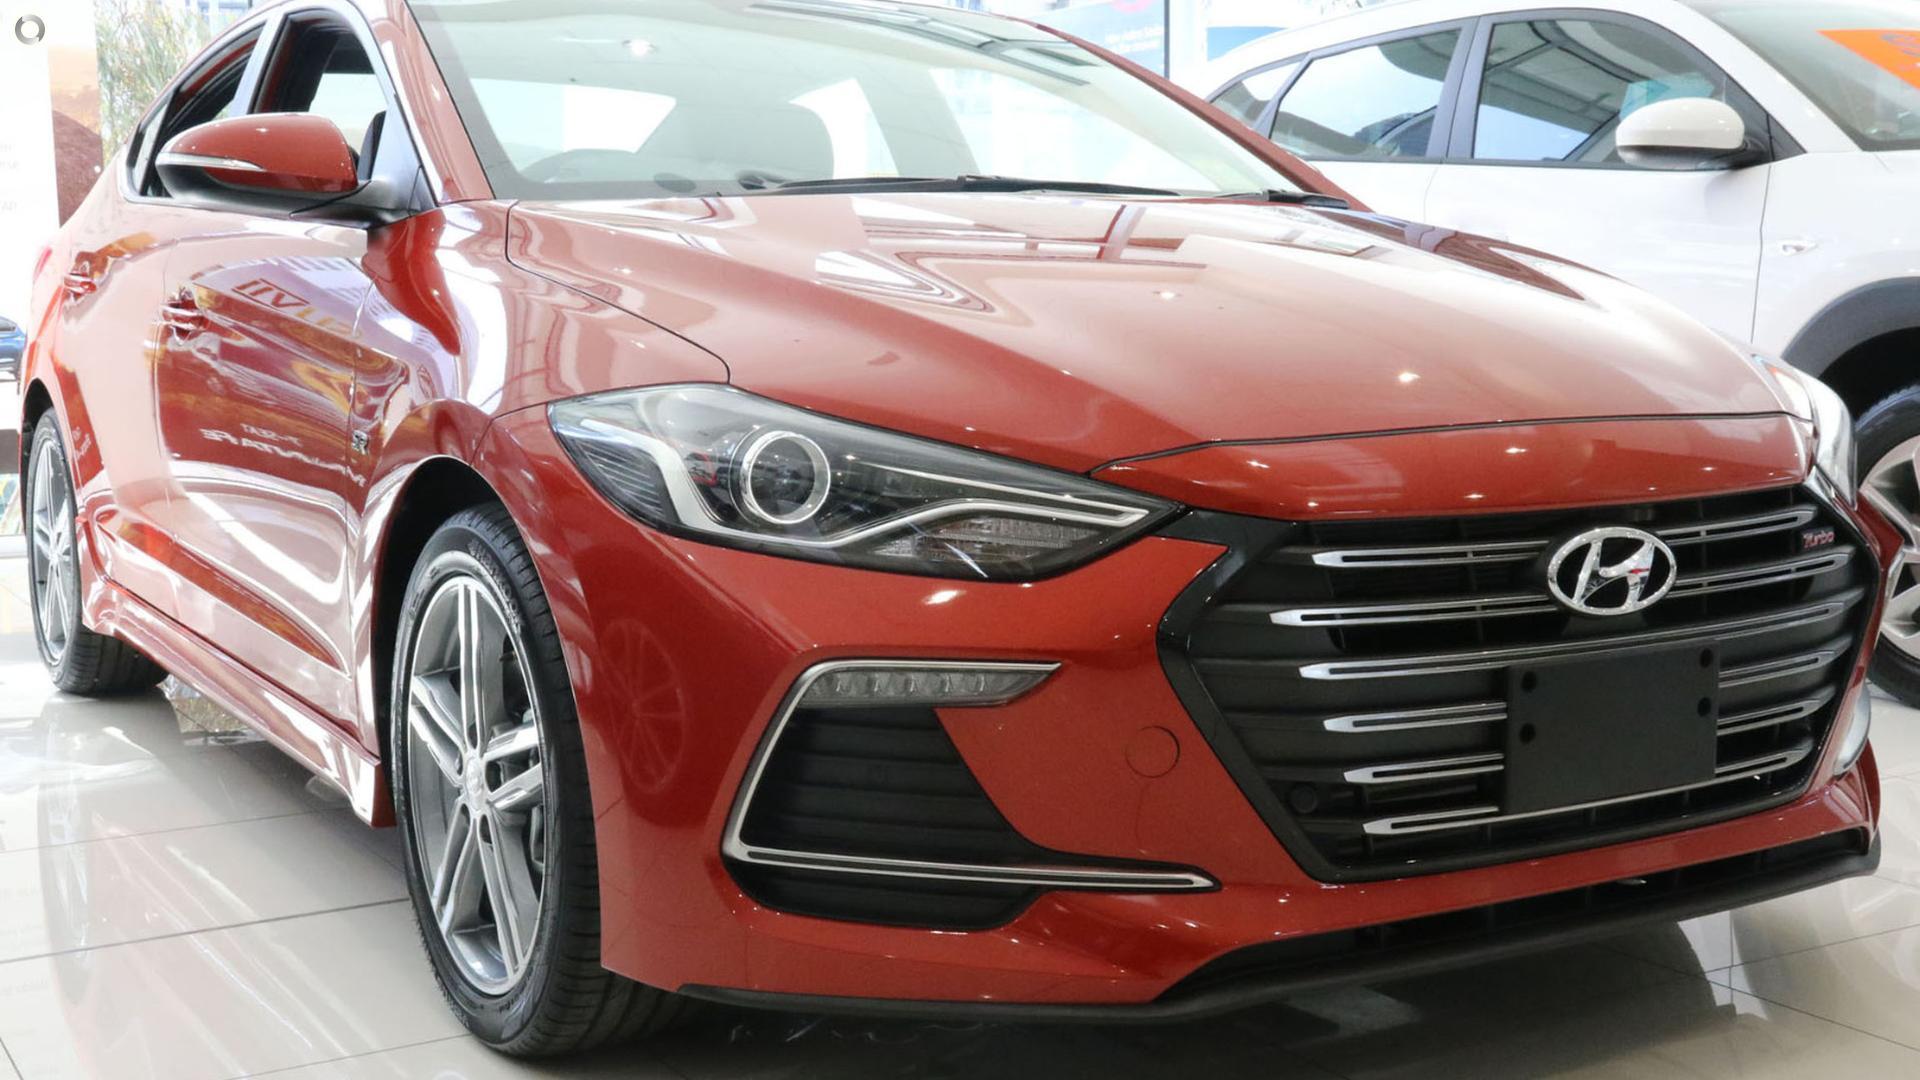 2018 Hyundai Elantra SR Turbo AD